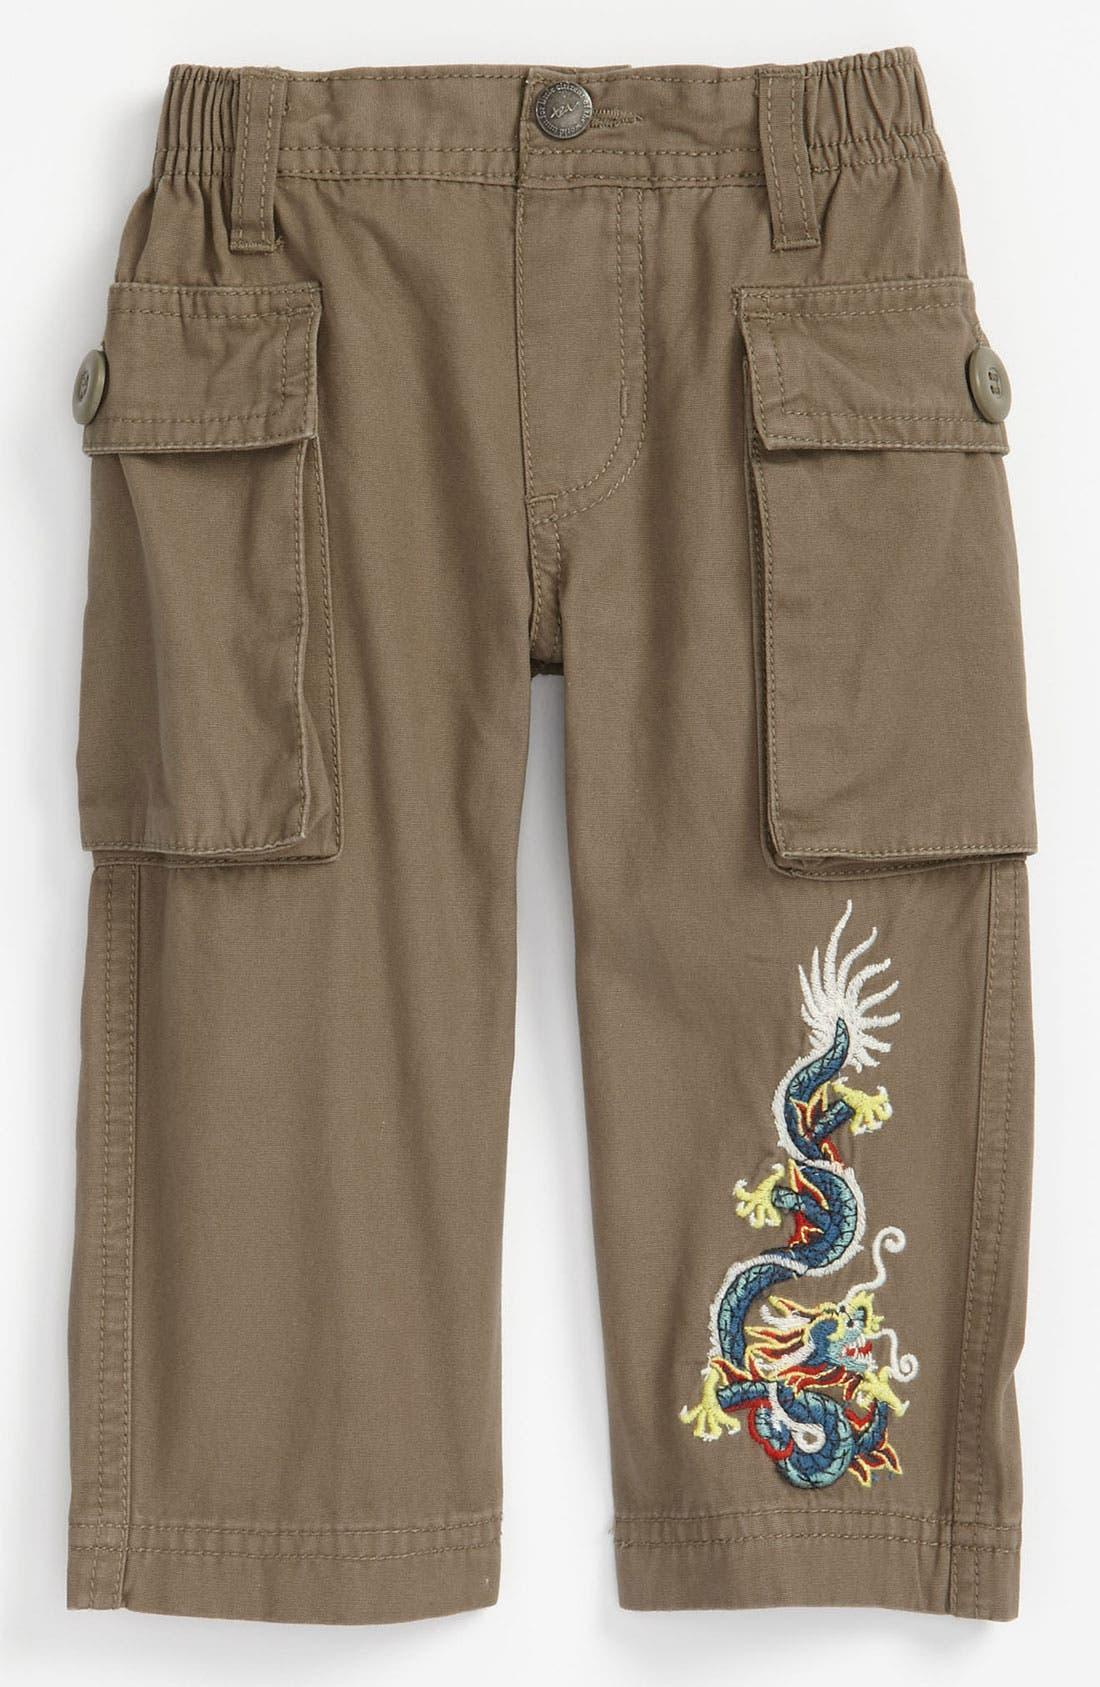 Alternate Image 1 Selected - Tea Collection 'Sejong' Dragon Pants (Infant)